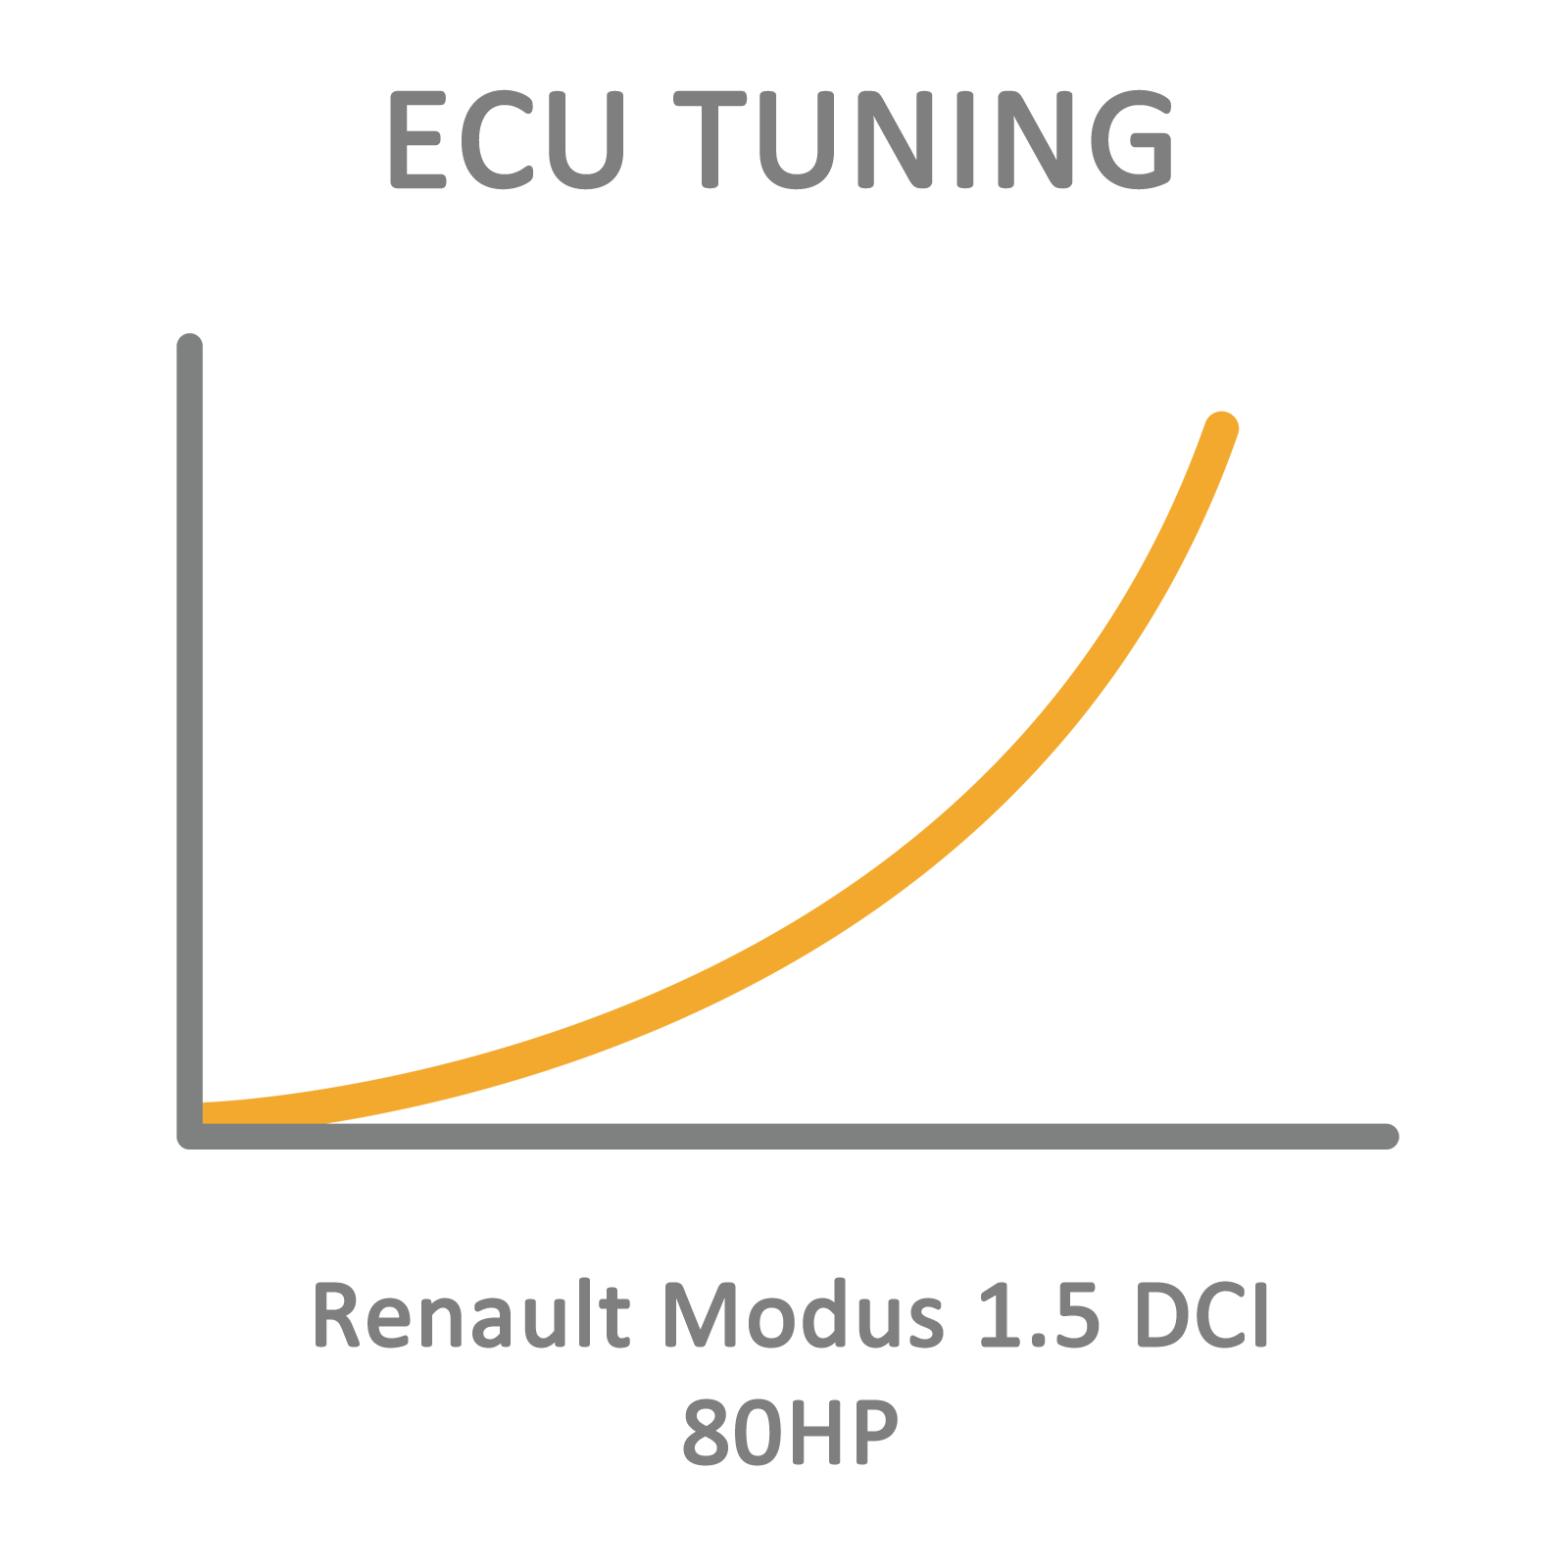 Renault Modus 1.5 DCI 80HP ECU Tuning Remapping Programming